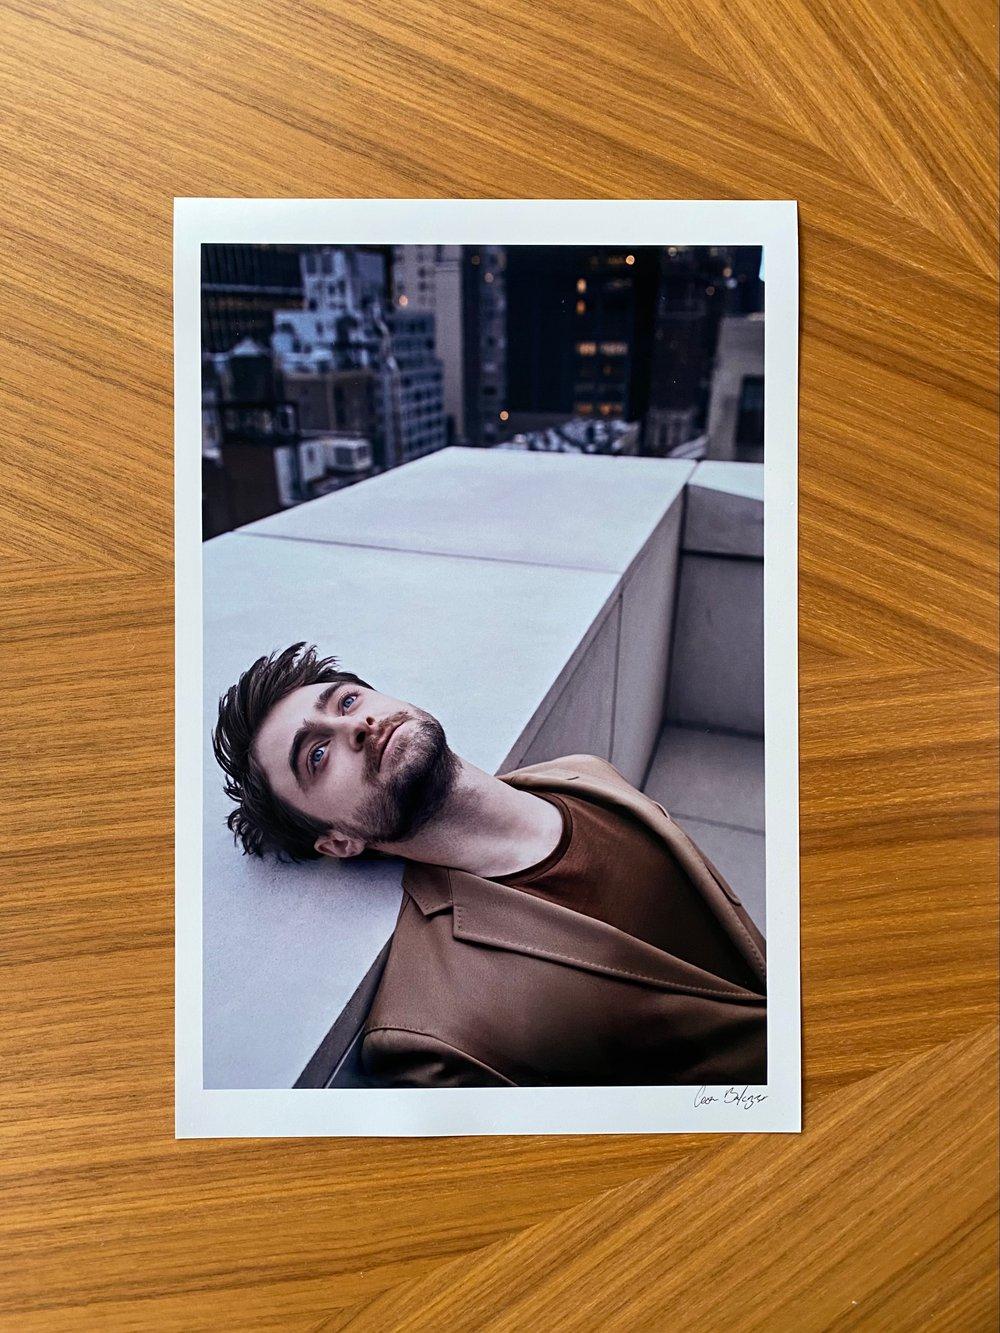 Image of Daniel Radcliffe